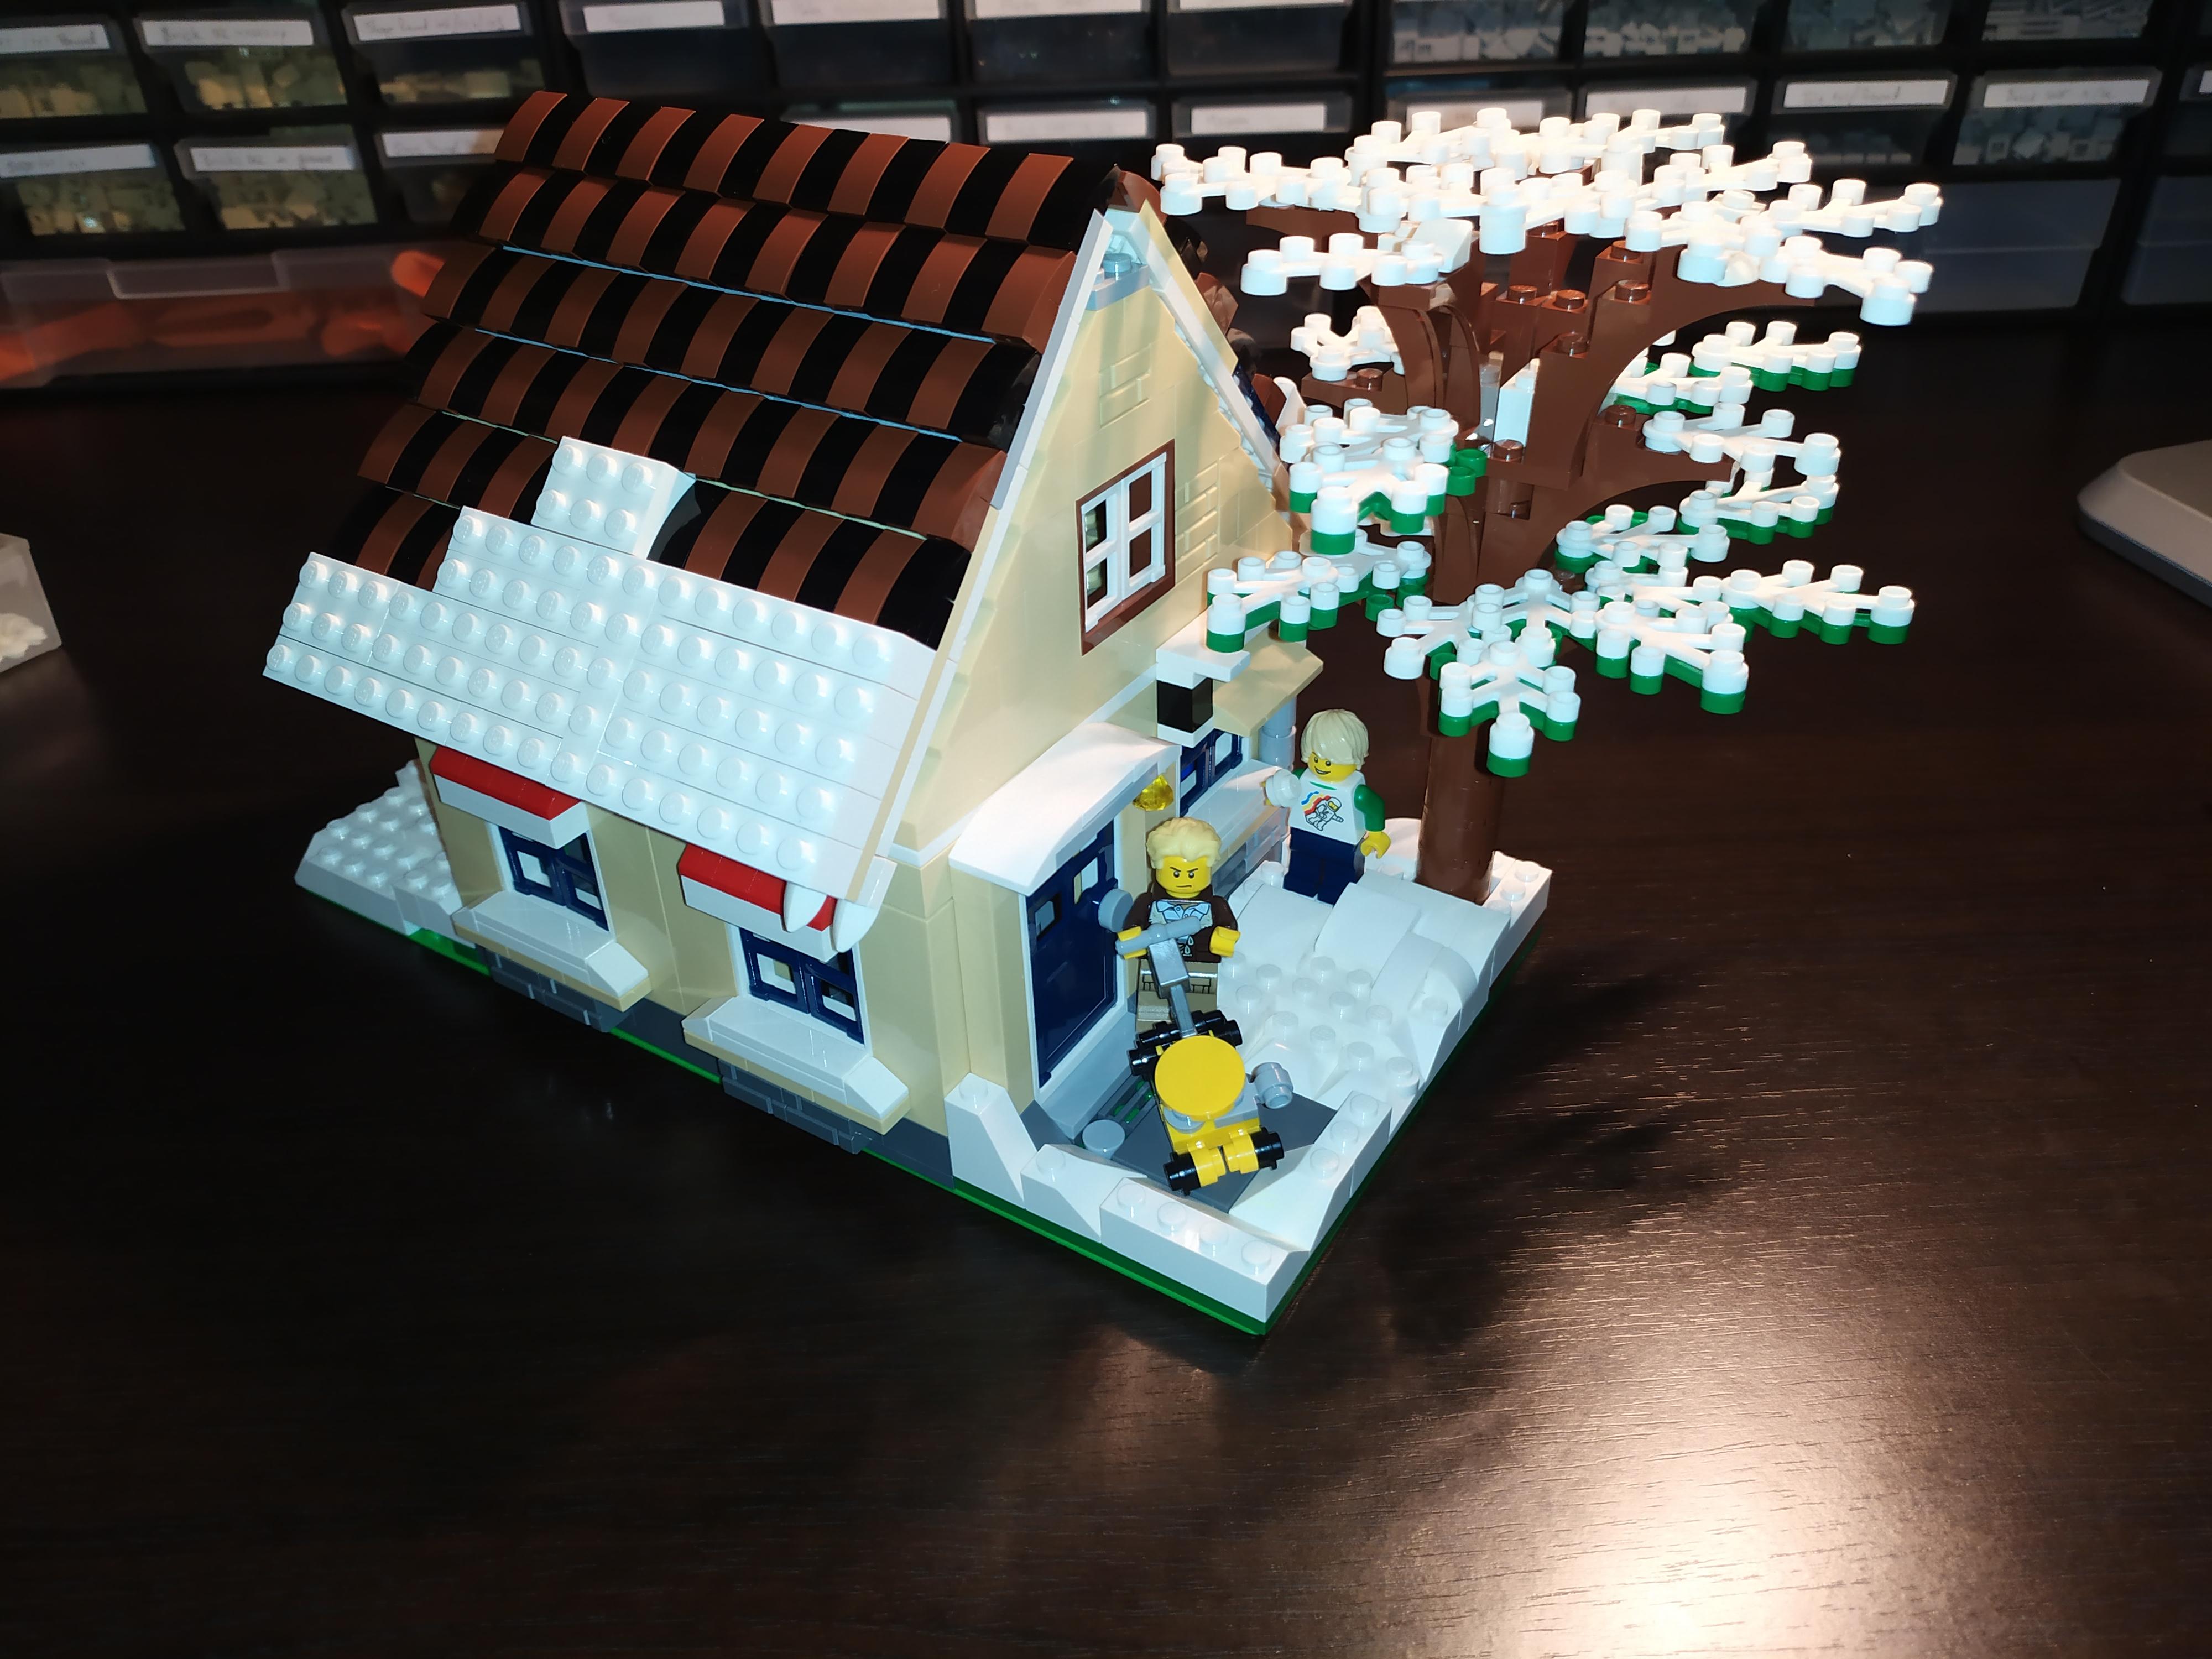 Concurs Winter Brickland – Creatia 4: Curatand zapada